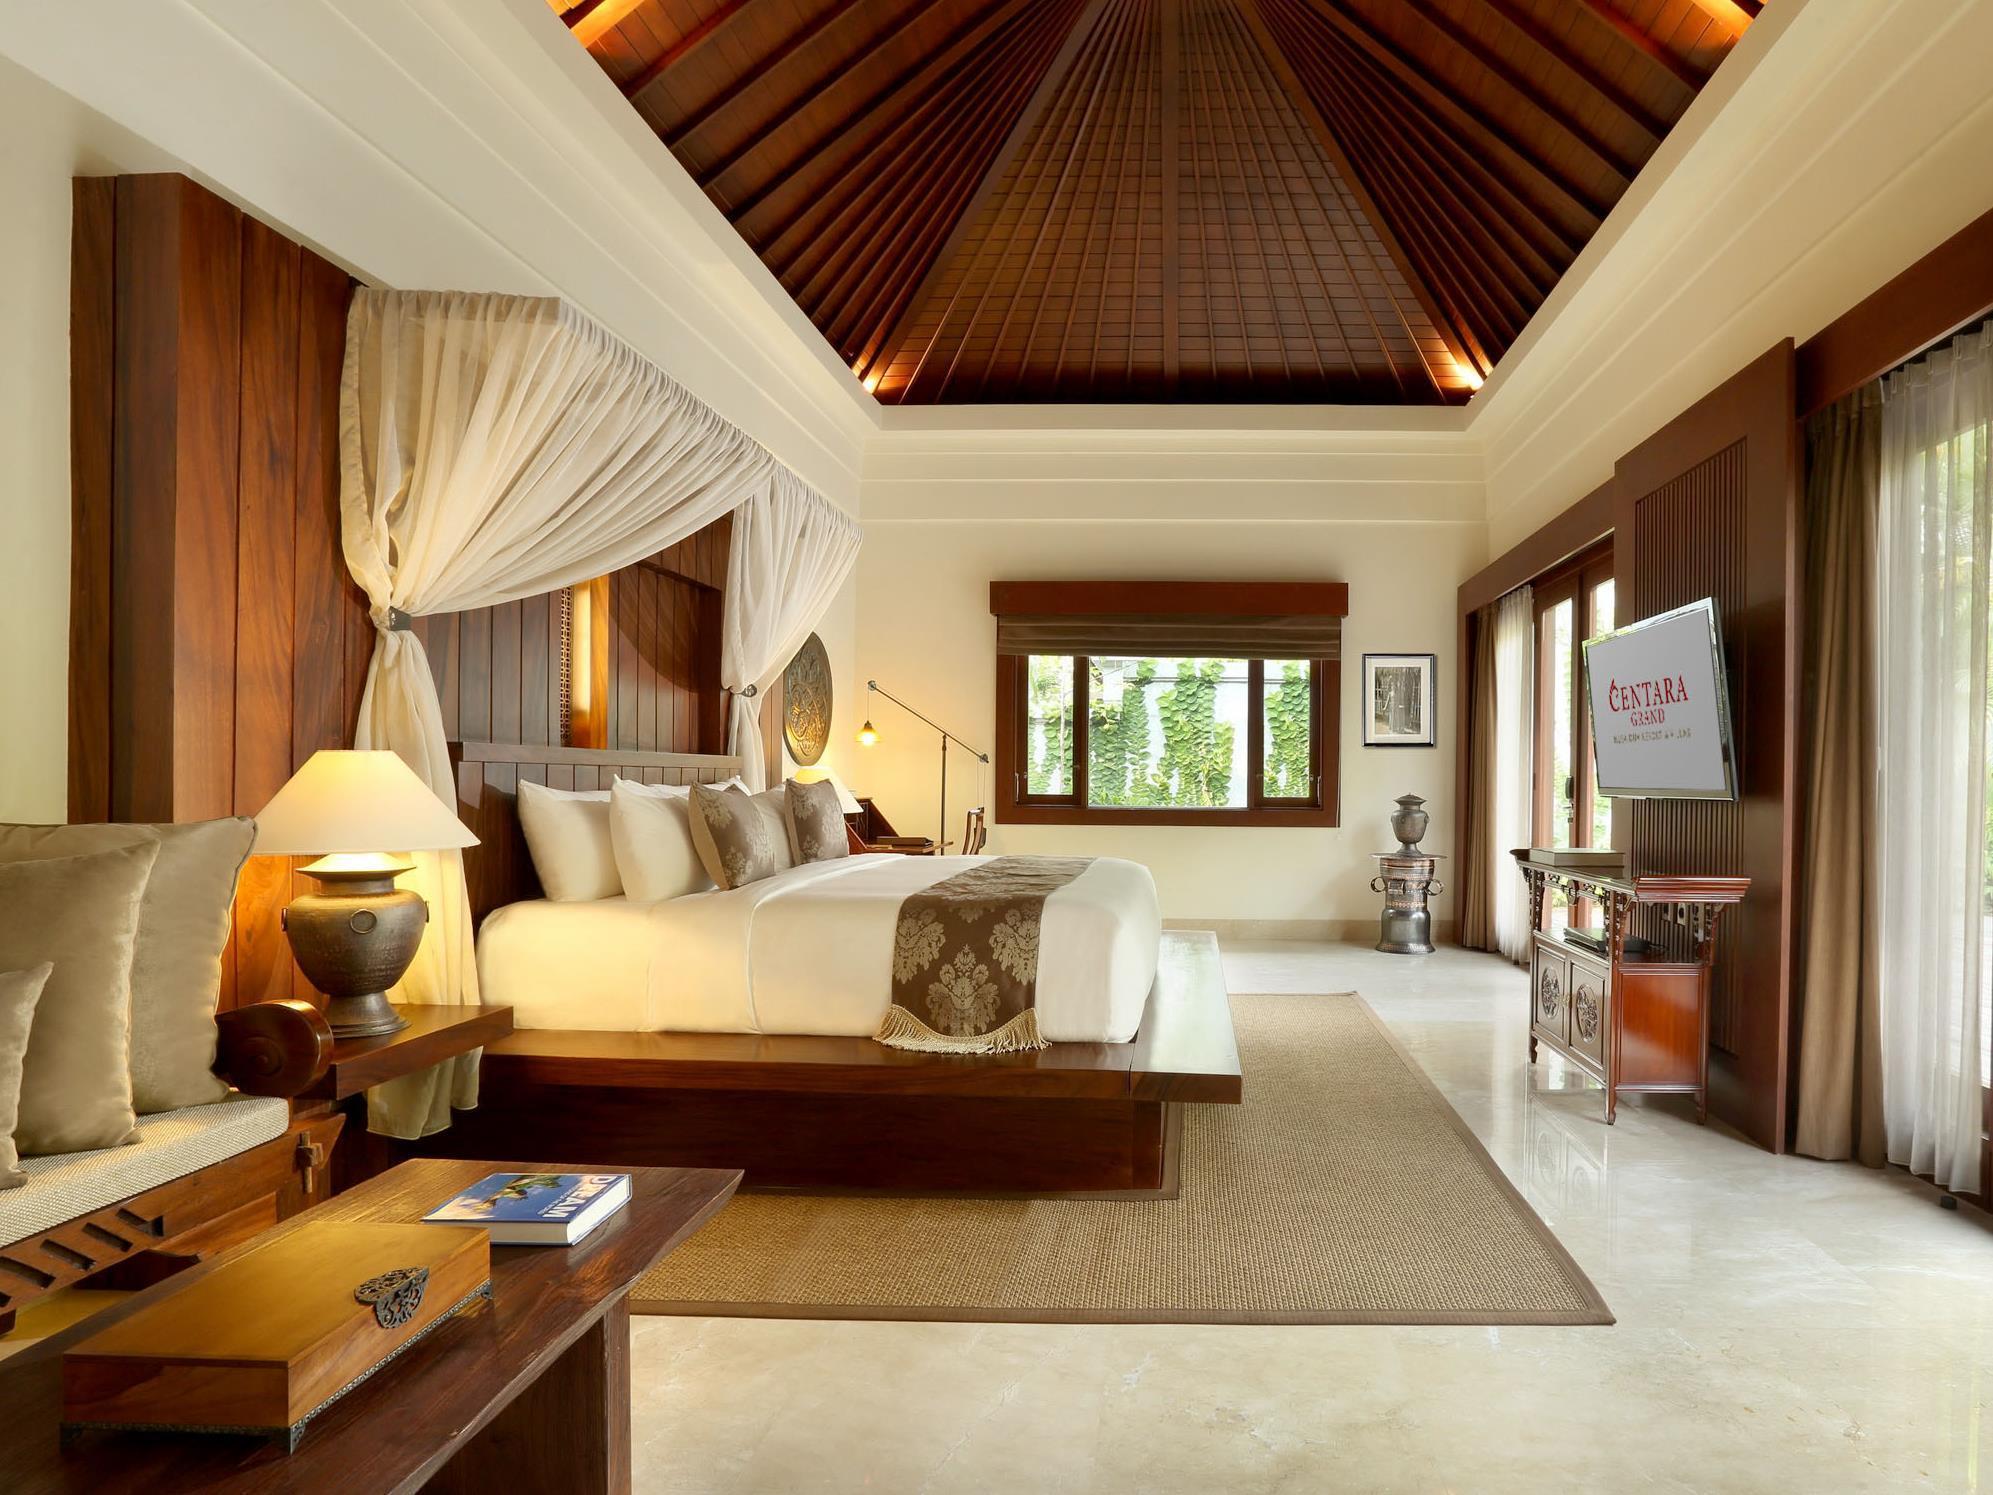 Centara Grand Villas Nusa Dua